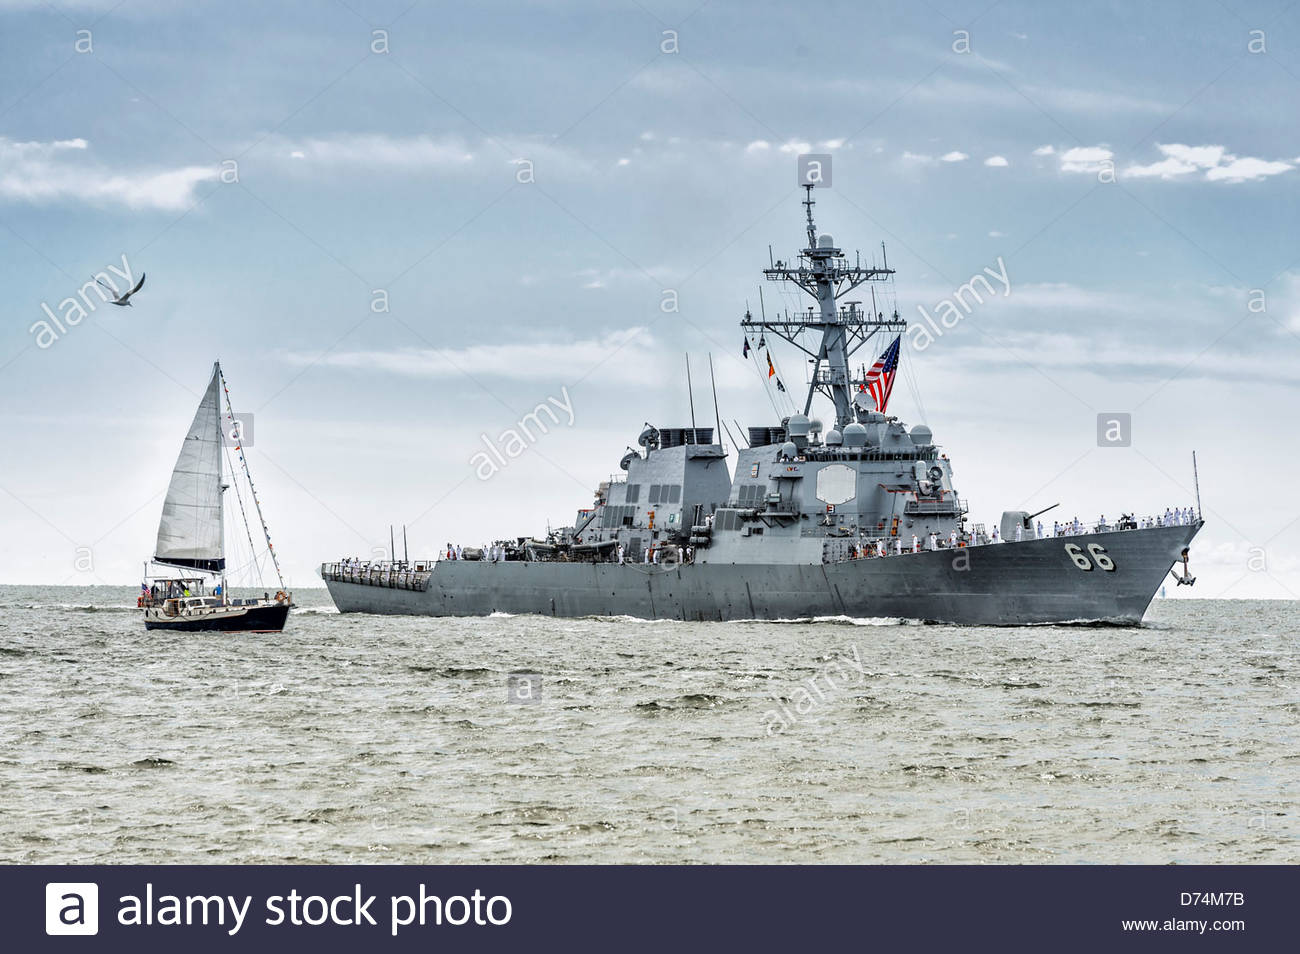 Destroyer USS Gonzalez (DDG 66) entering Hampton Roads Harbor for OpSail 2012 on June 6, 2012 - Stock Image